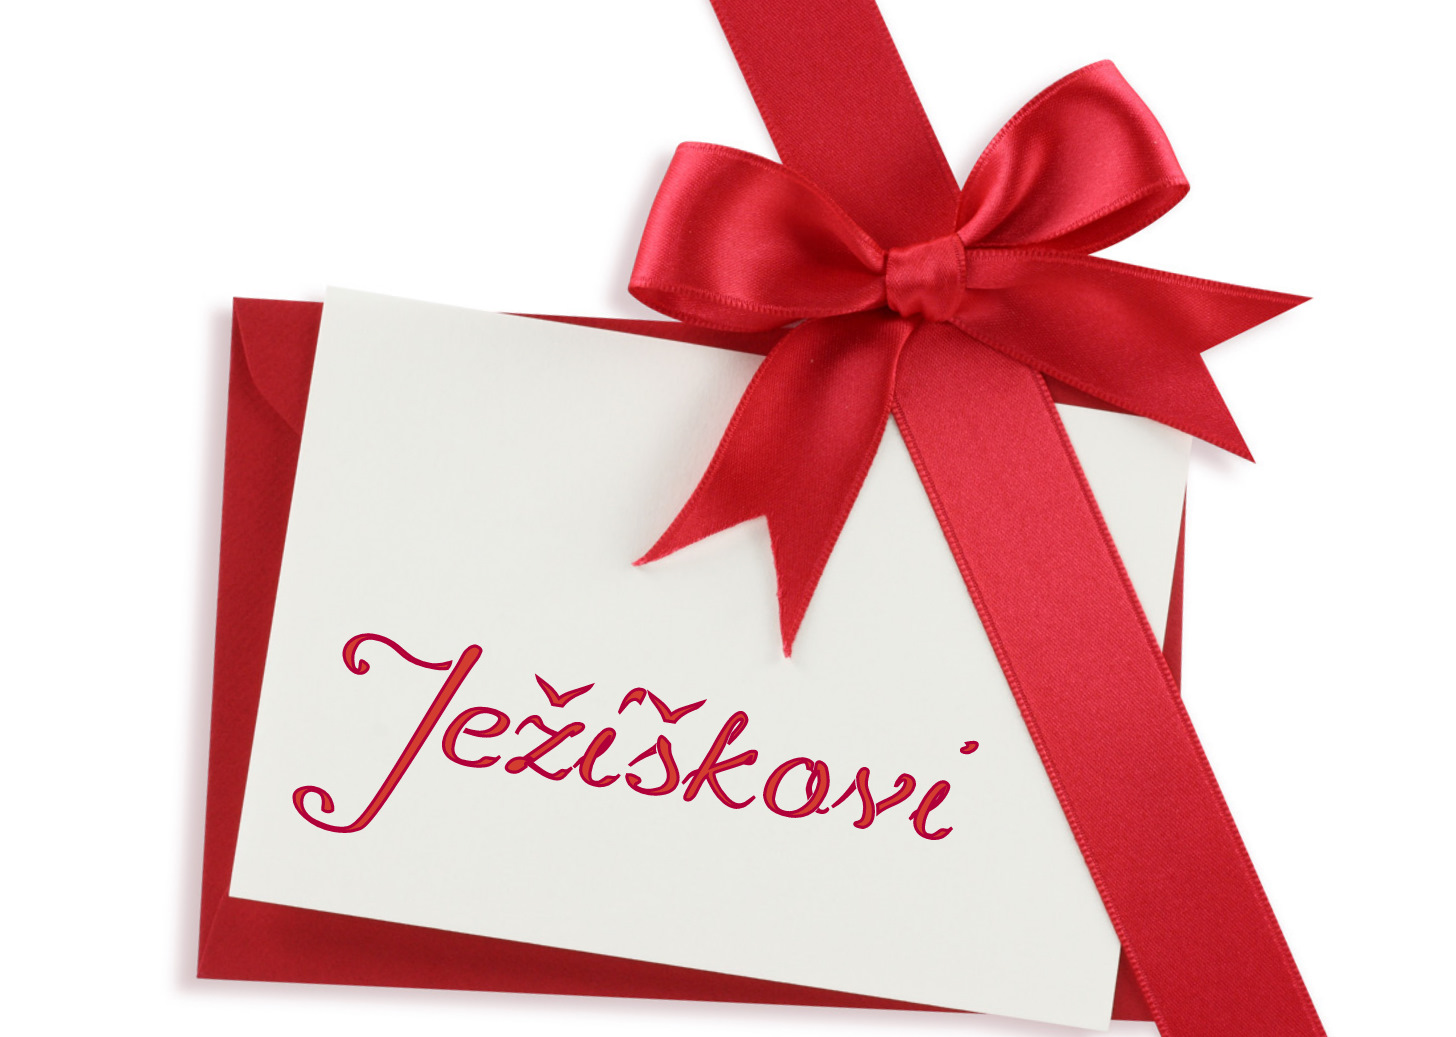 http://2.bp.blogspot.com/-YZJCuLFRTTw/TtMzo30X7xI/AAAAAAAAFVM/mRHL1FCaPO0/s1600/Card_ribbon+%25282%2529.jpg